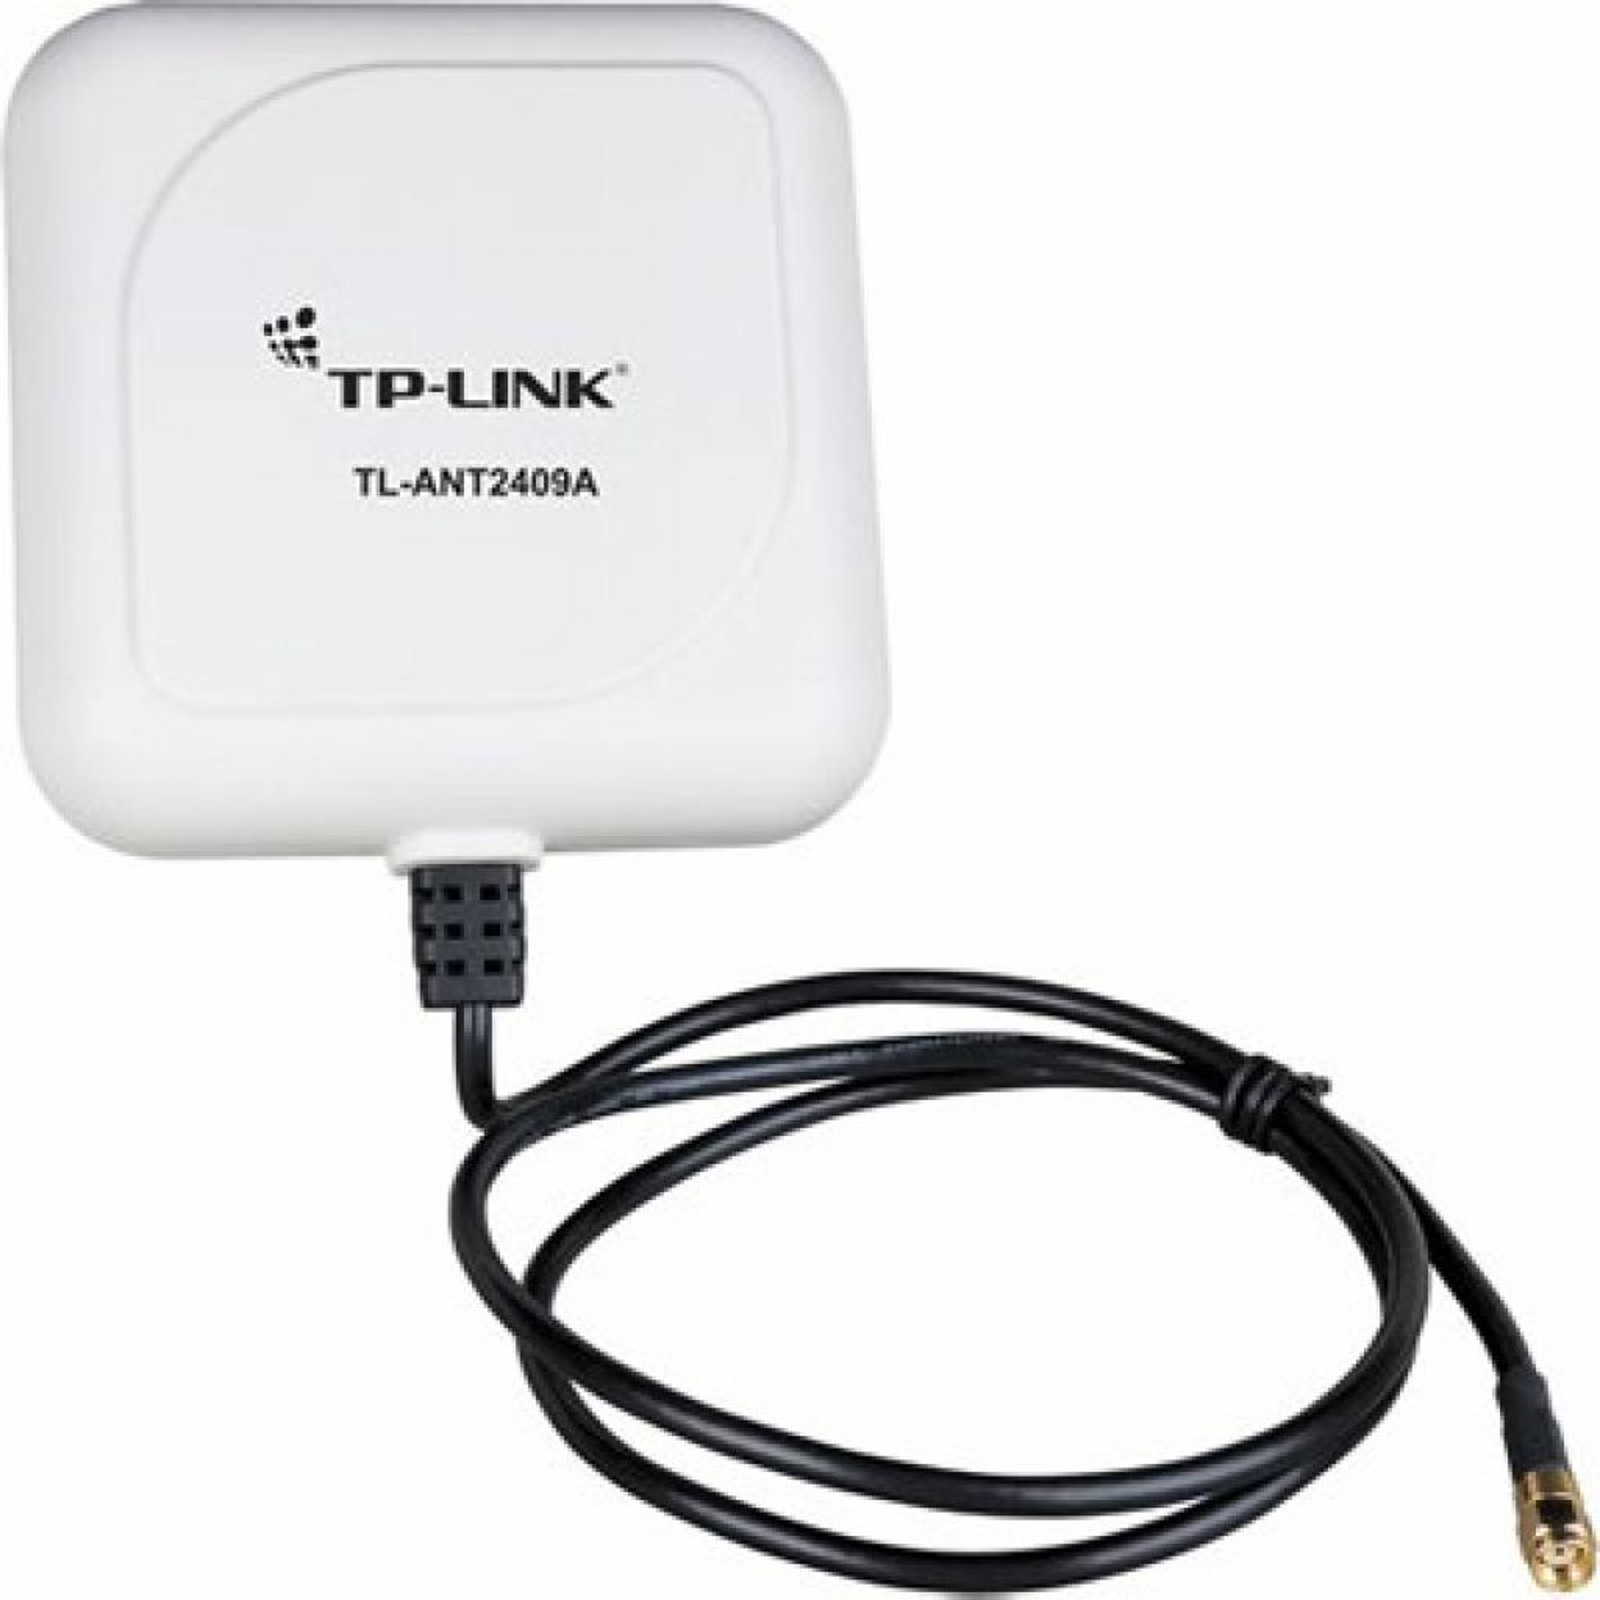 Антенна Wi-Fi Wireless Antenna 9dBi направленная, TP-Link (TL-ANT2409A)